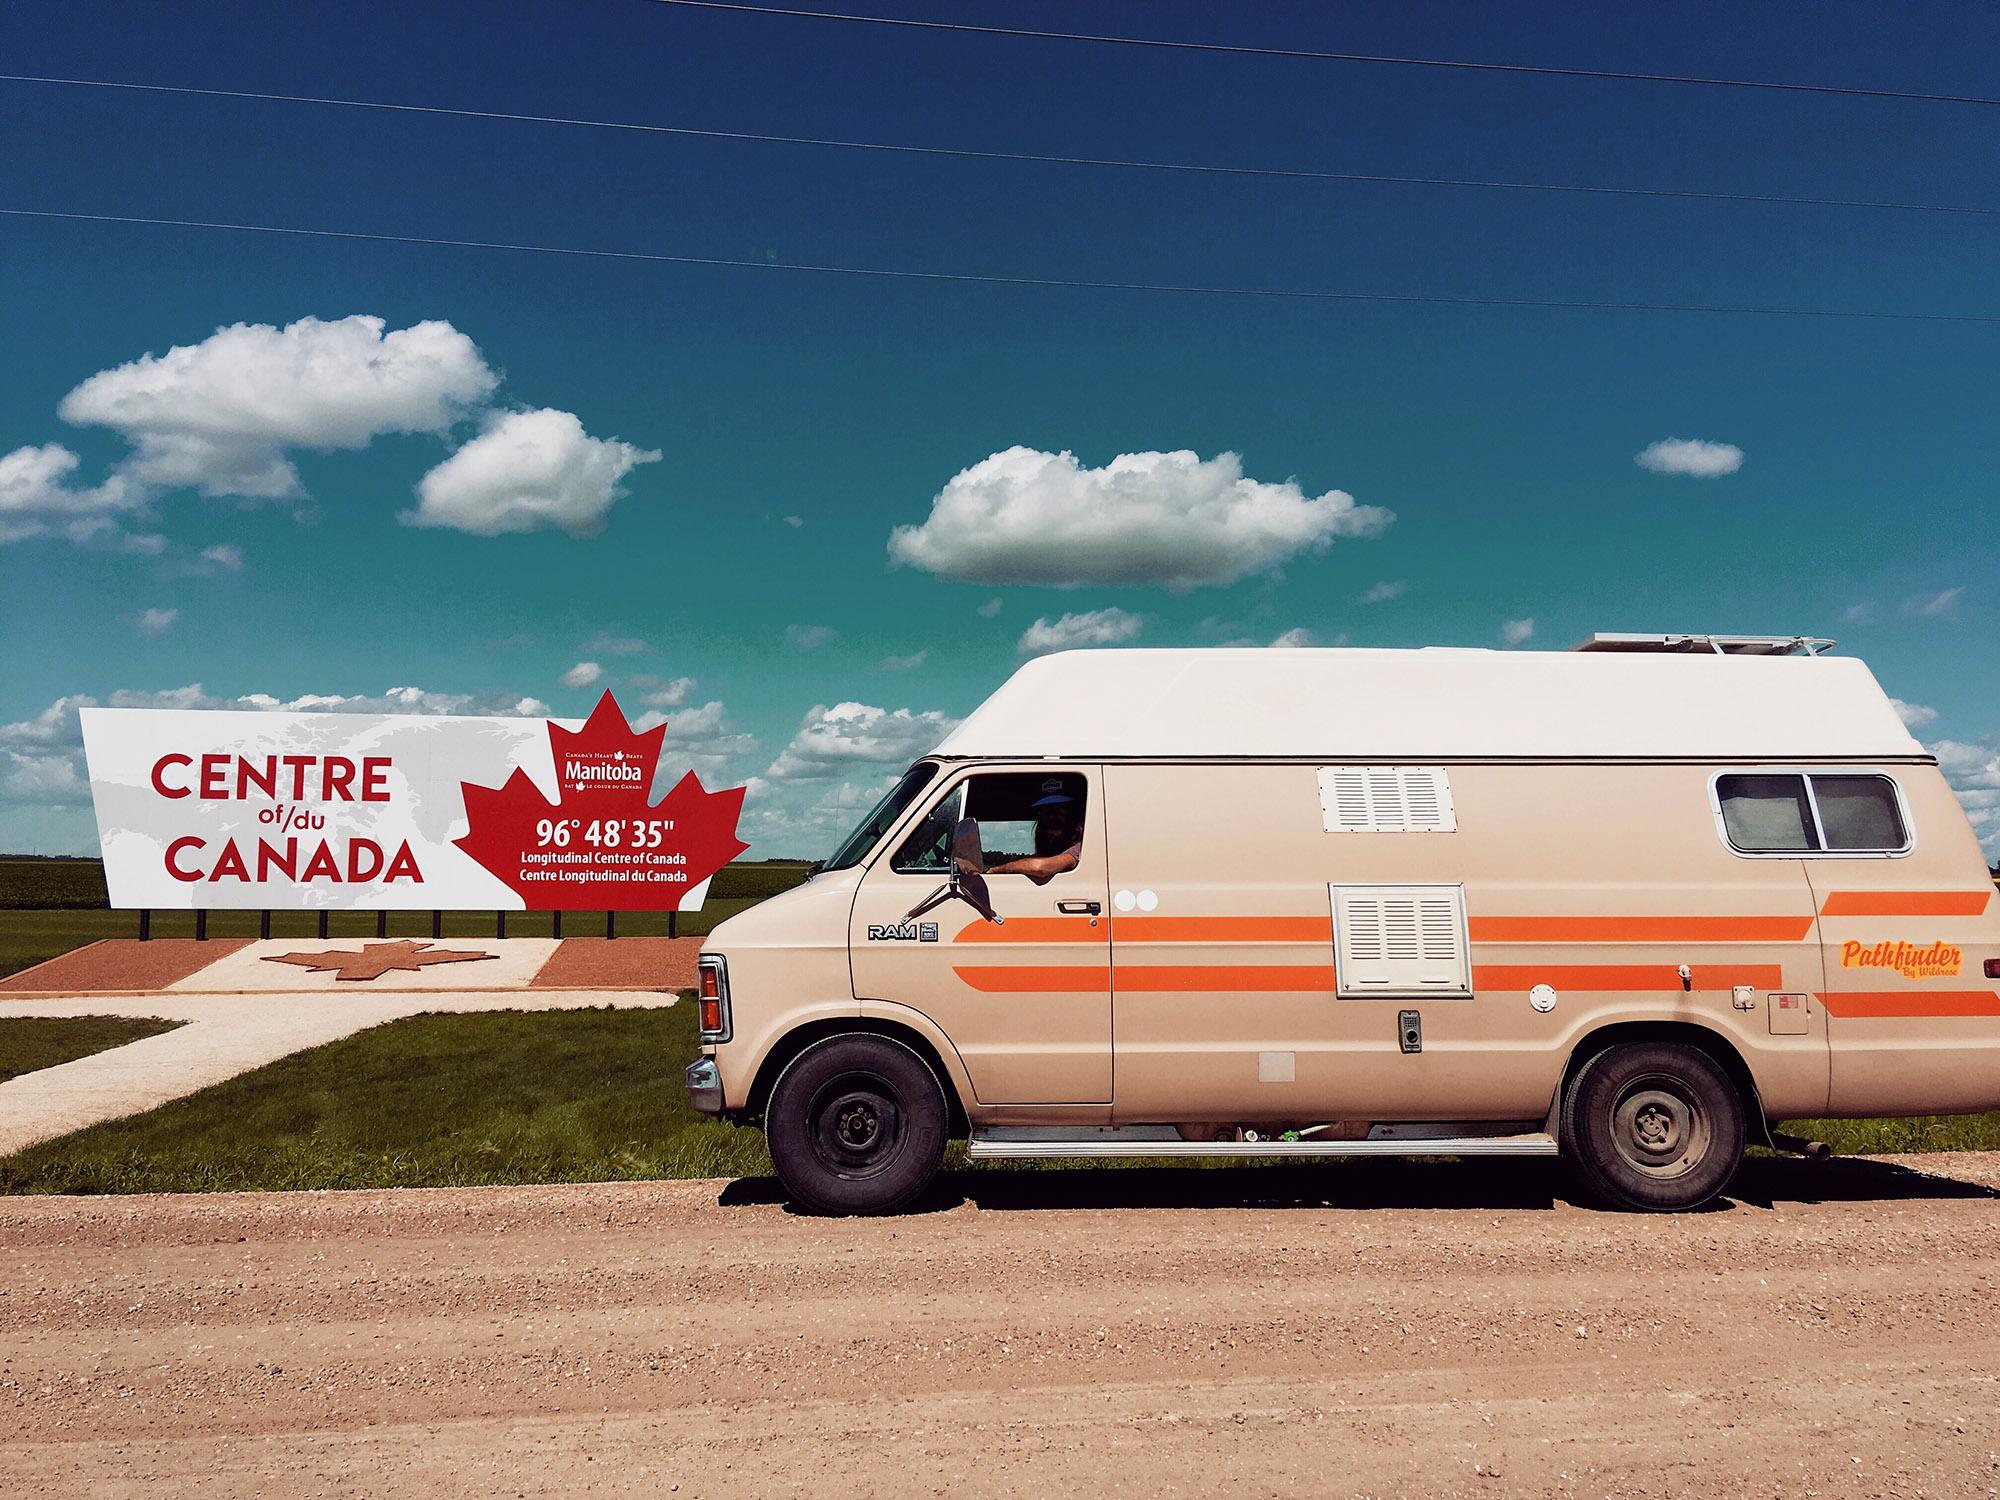 Generic Van Life - Friendly Manitoba Longitudinal Centre of Canada